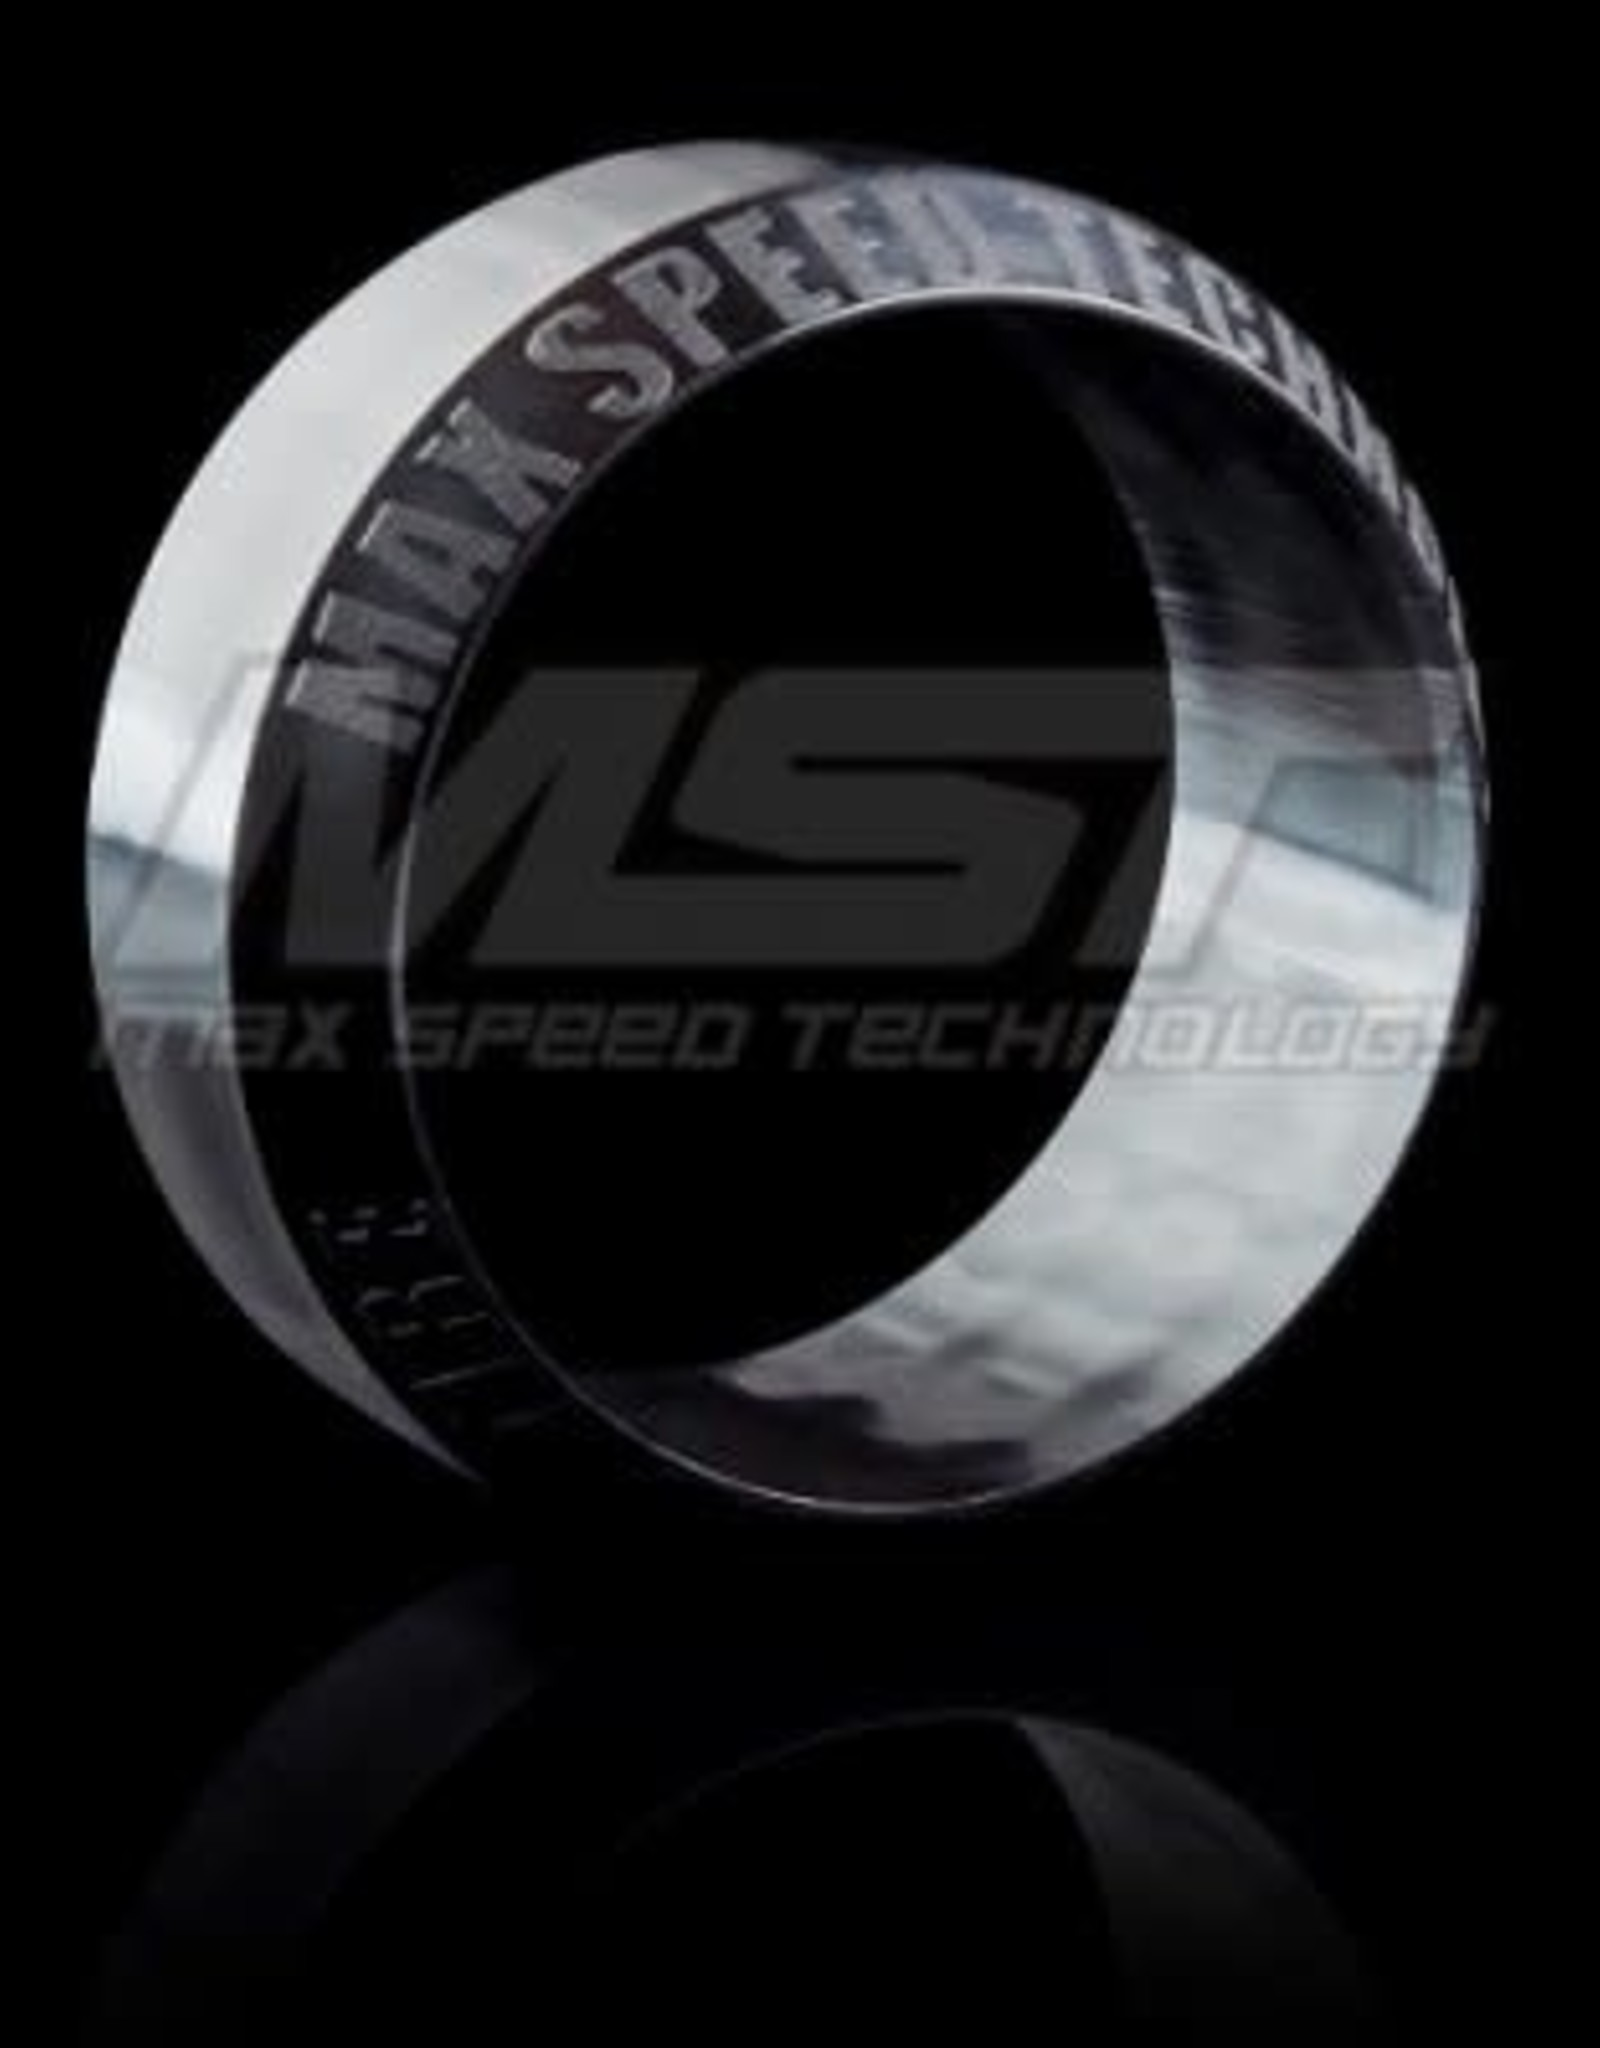 MST MXSPD101023 GA26 Tire (HP)(4) by MST 101023